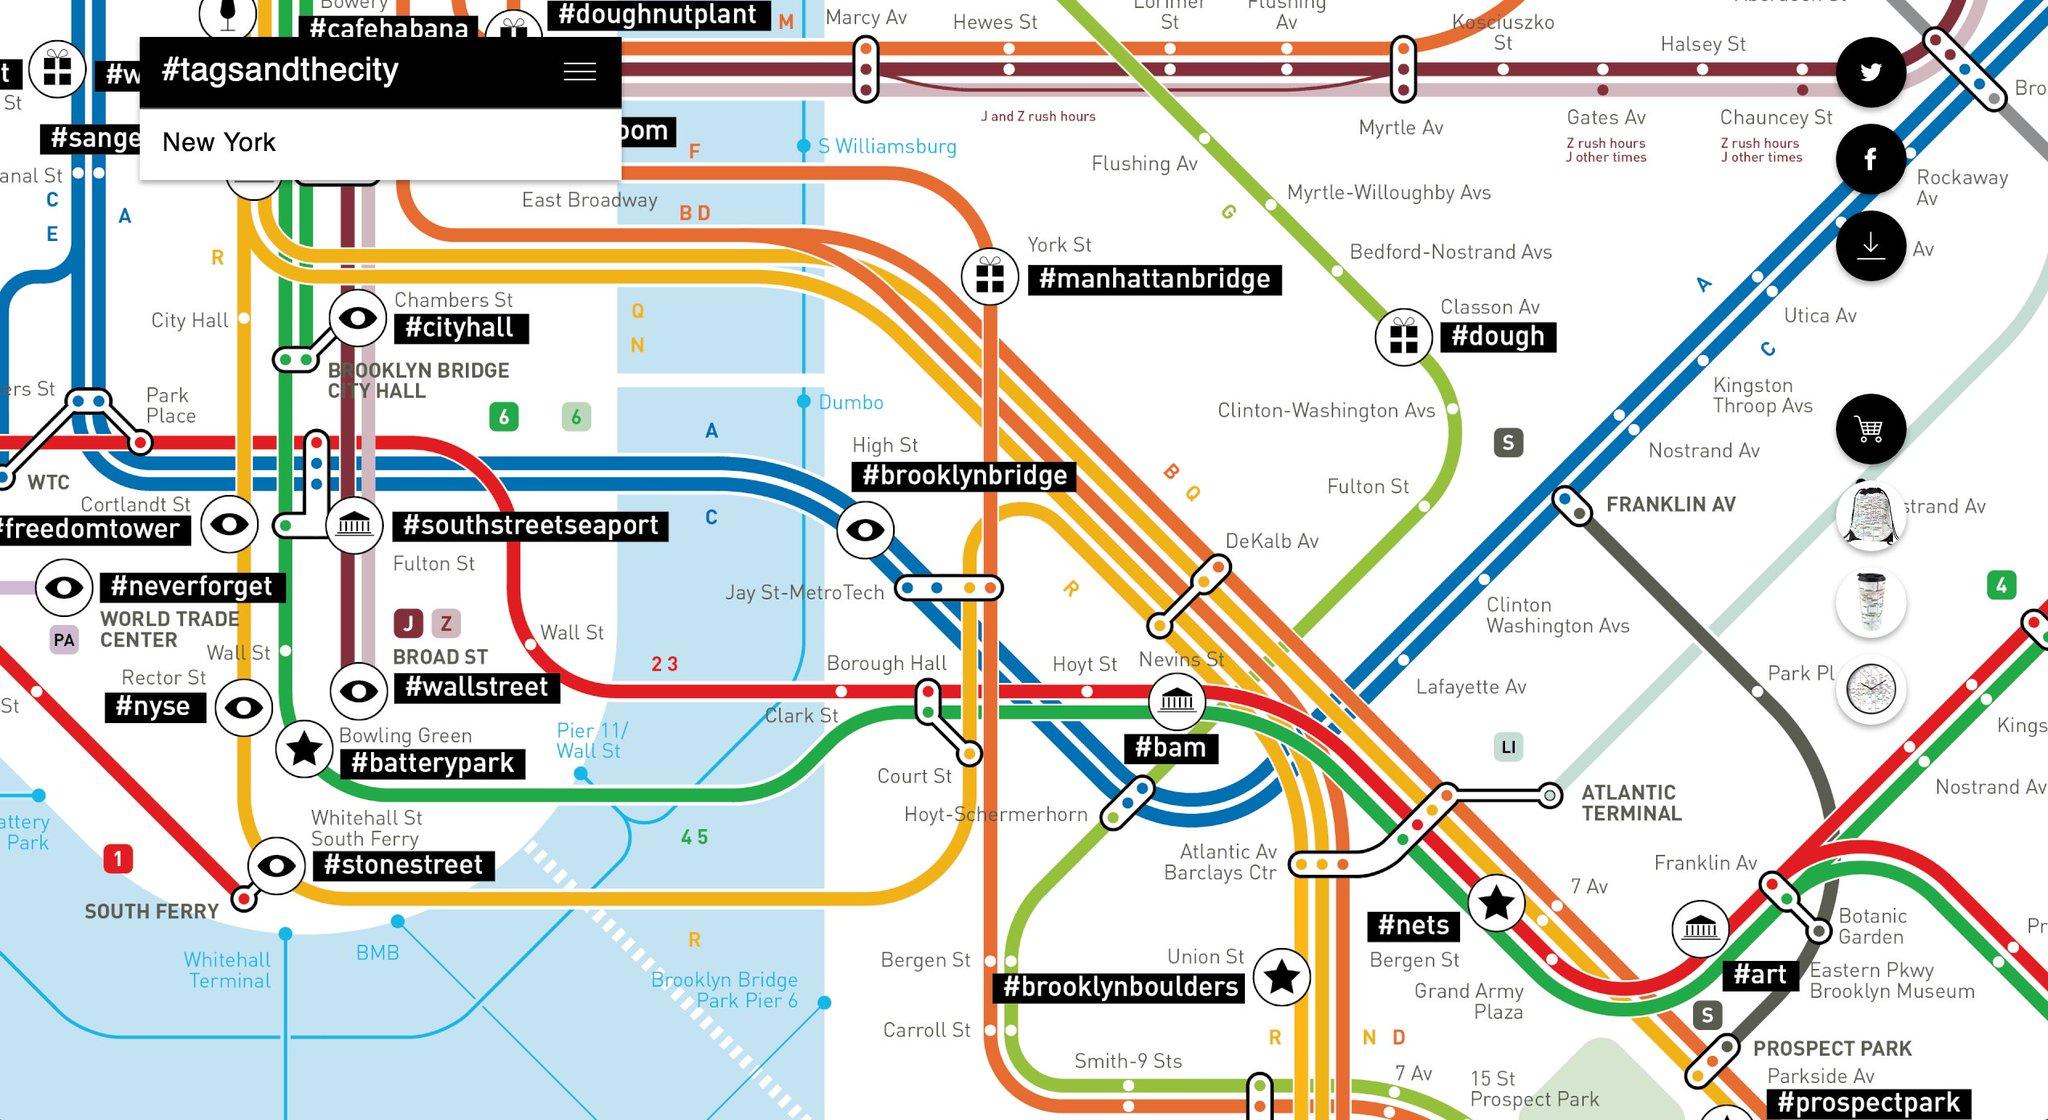 Nyc Subway Map Bam Park.Digital Dumbo On Twitter Three Dudes Overlaid Popular Instagram